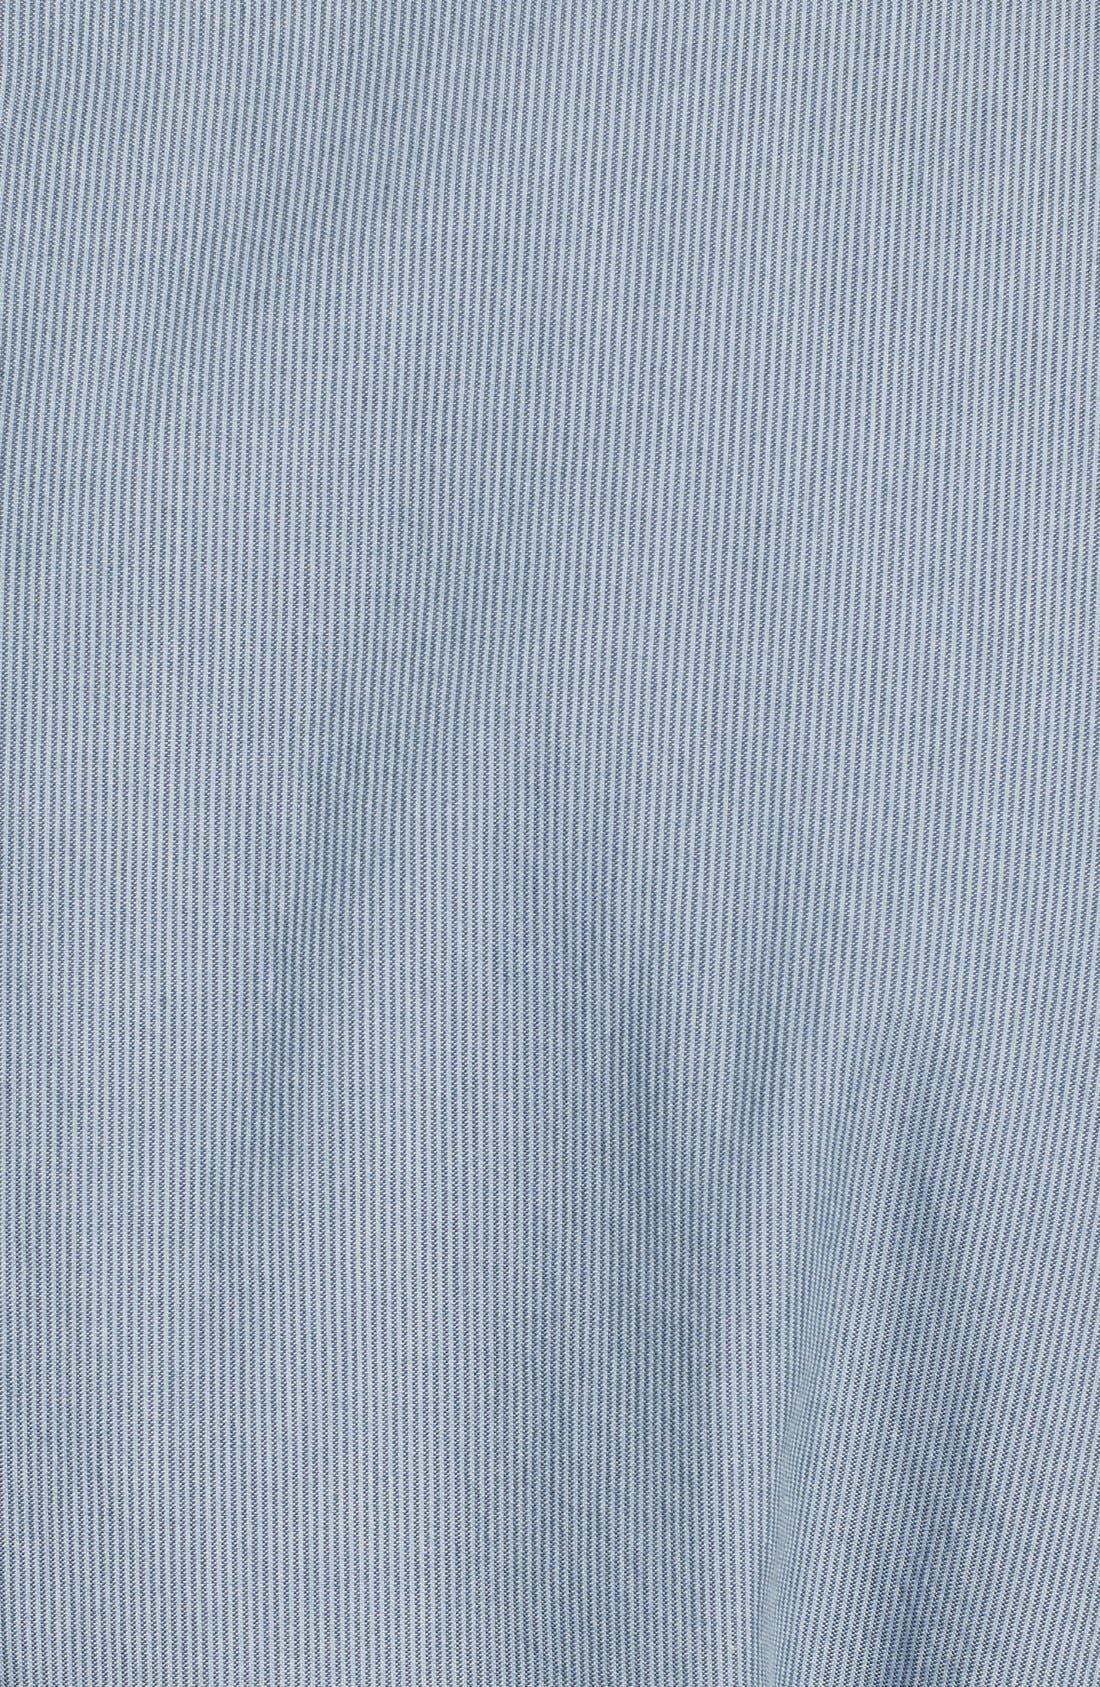 Alternate Image 3  - Kroon 'Axel' Regular Fit Vest